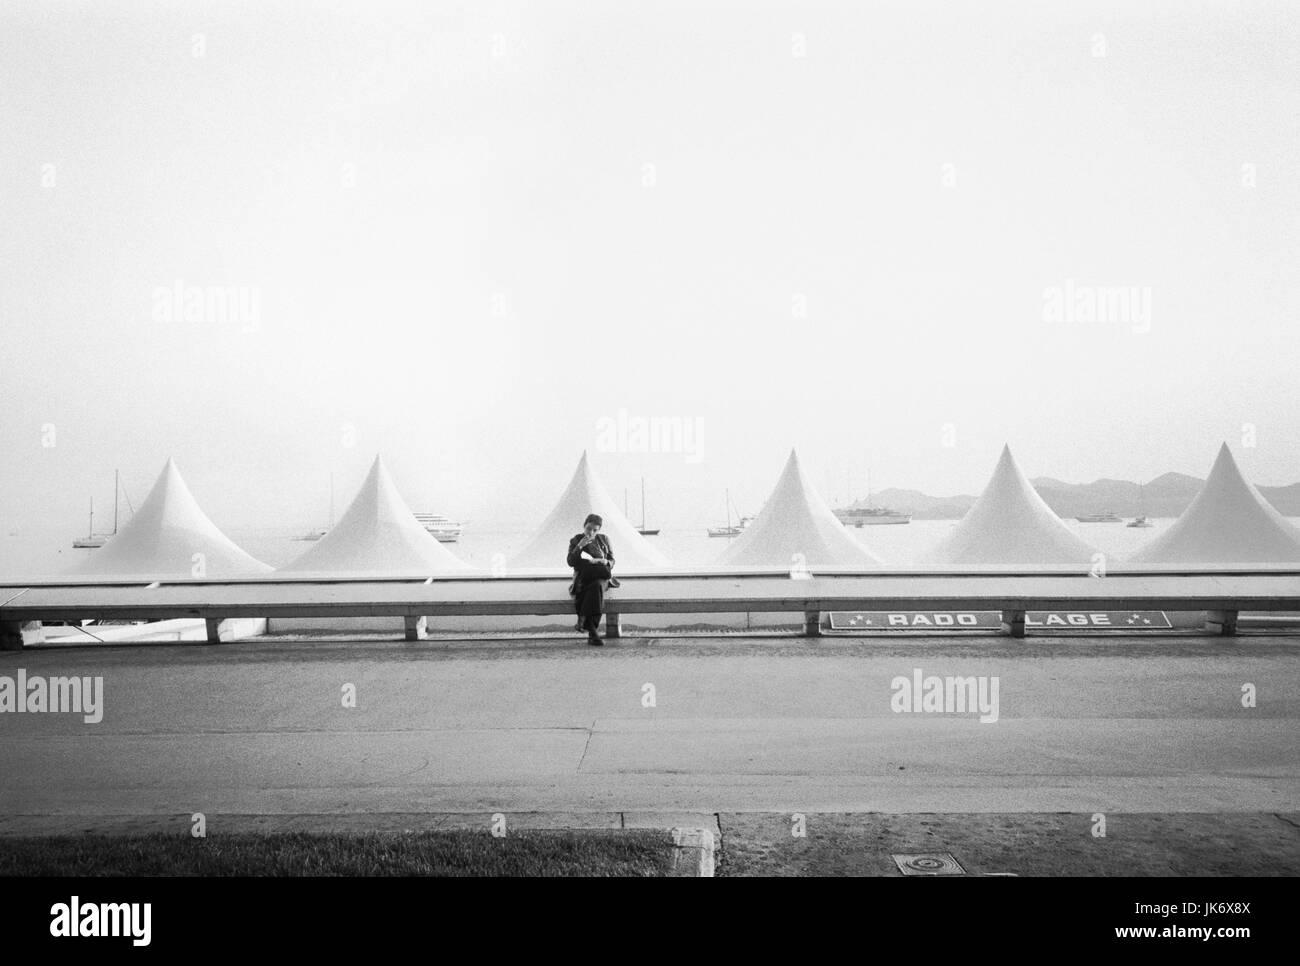 Frankreich, Französische Riviera, Cannes,  Strandzelte, Cannes Film Festival, Person,  s/w no model release - Stock Image